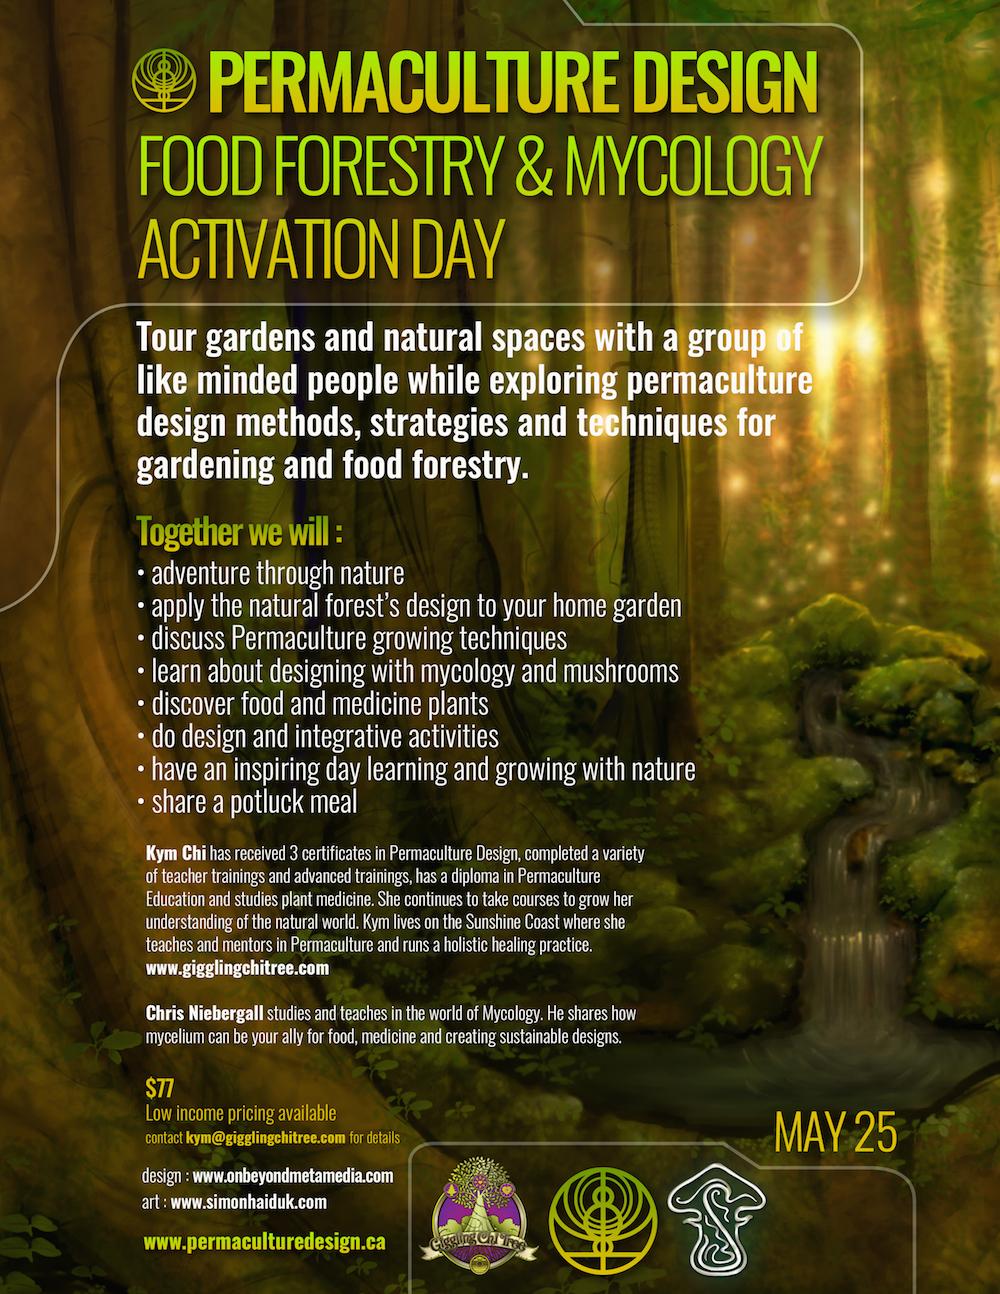 Permaculture Design for Regenerative Gardening – Food